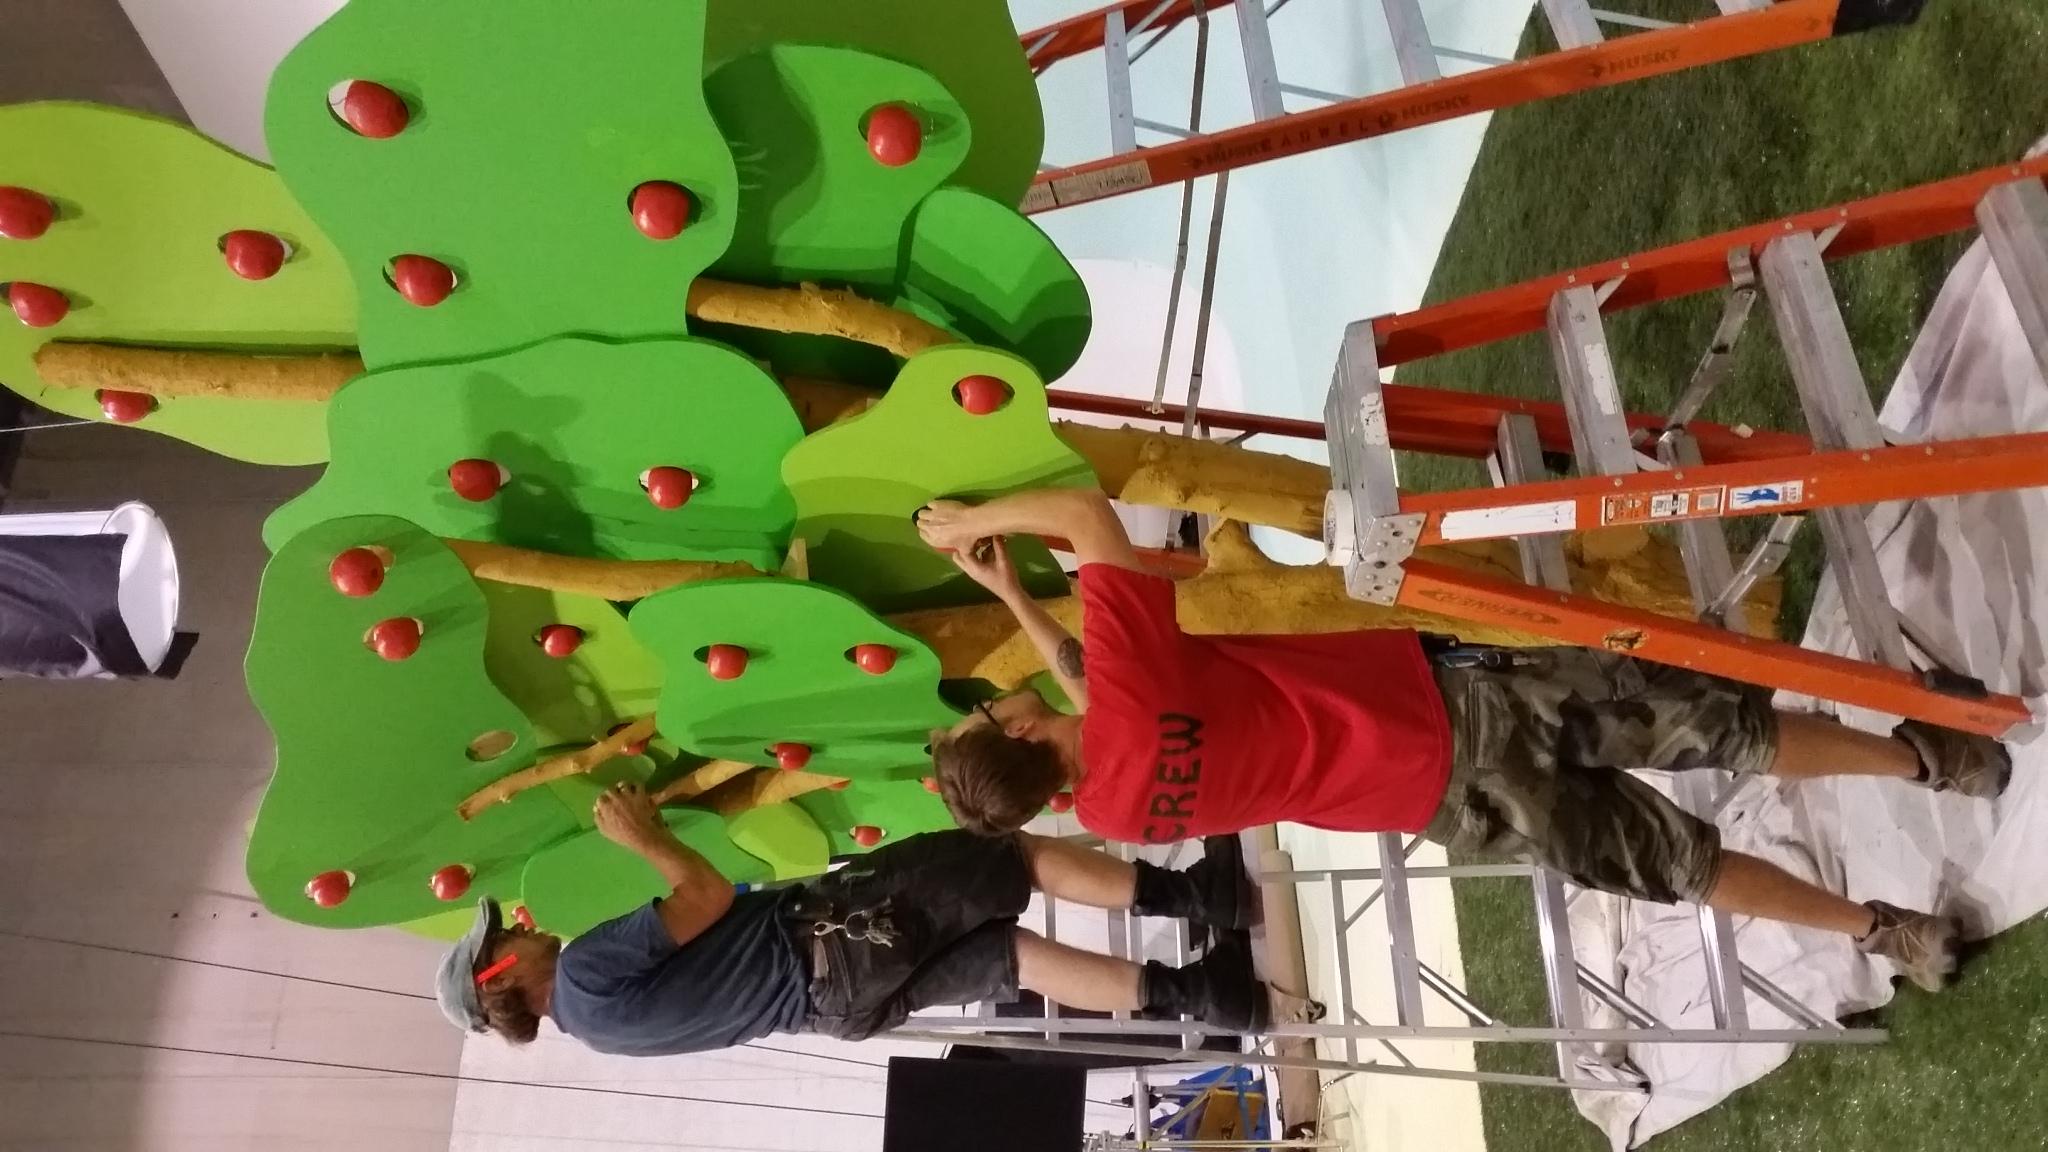 Union Set Dresser gary Surber(on ladder) works on a set piece for Health Partners with art assist tom kristjanson.